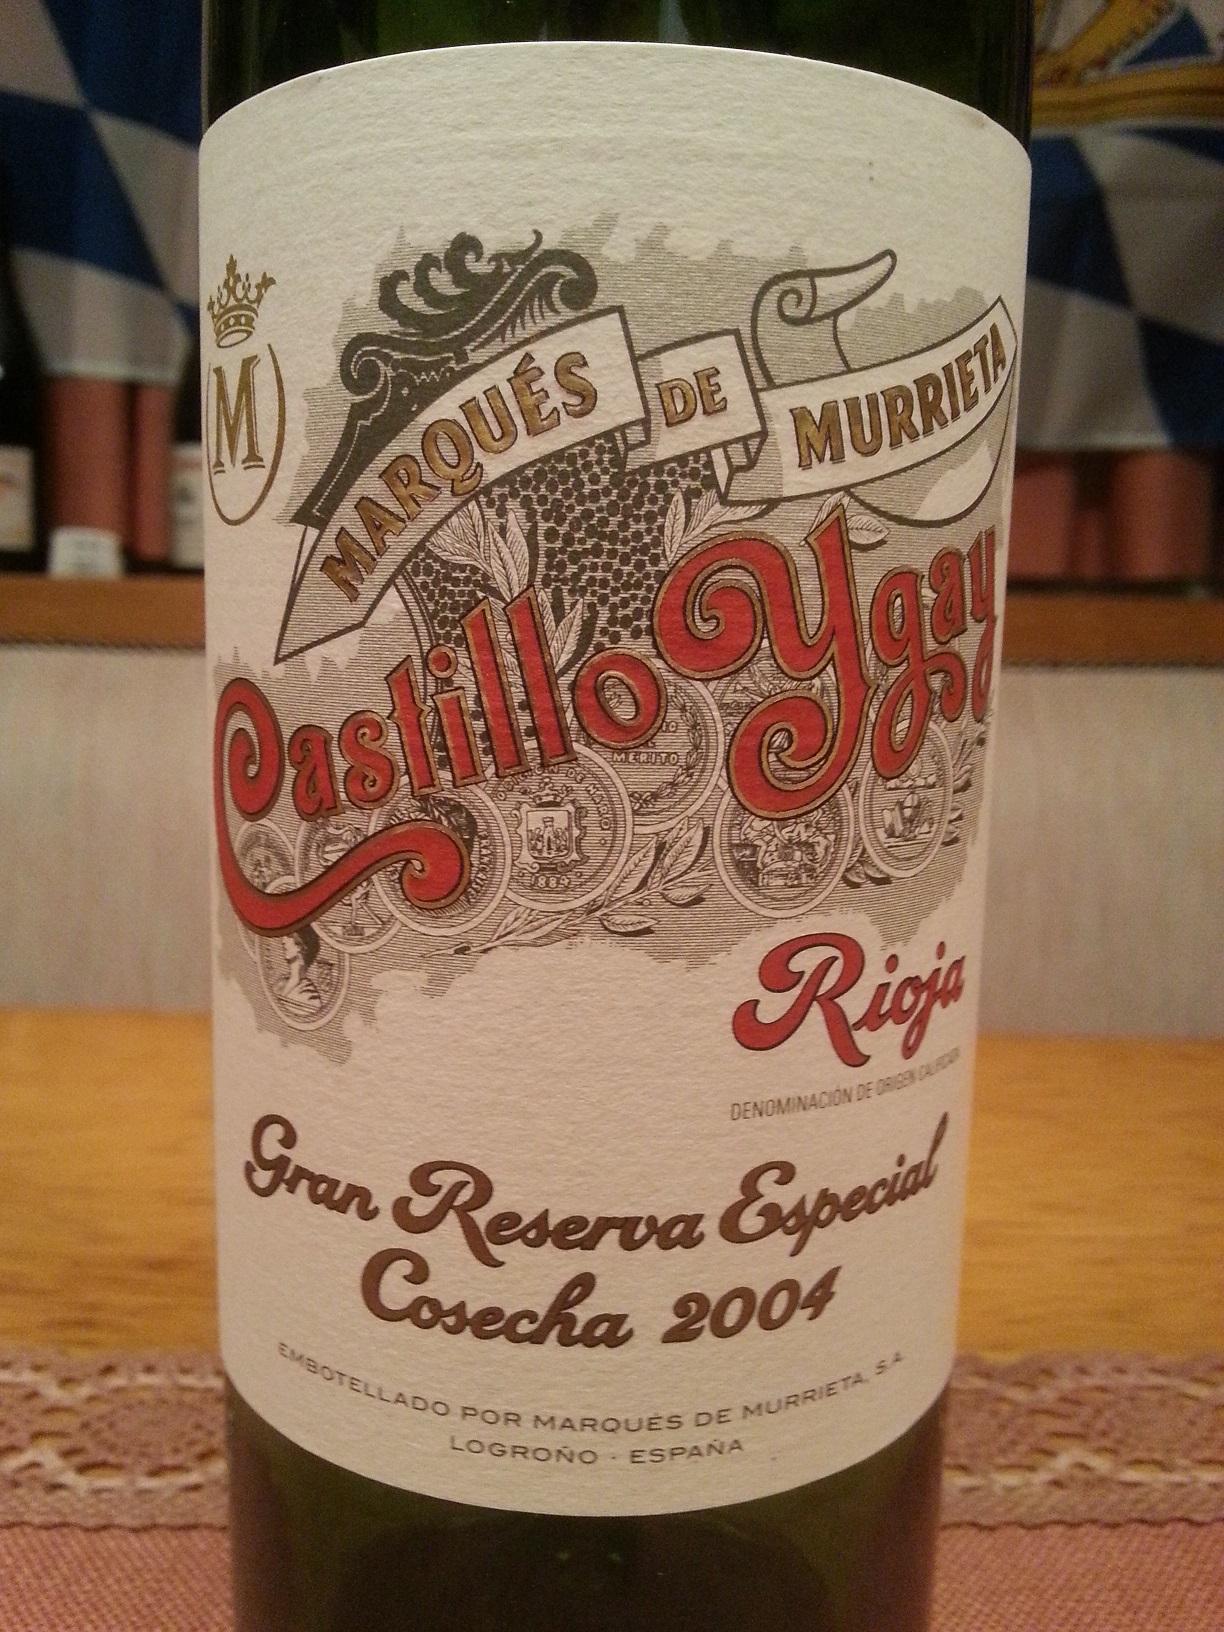 2004 Castillo Ygay Gran Reserva Especial | Marqués de Murrieta